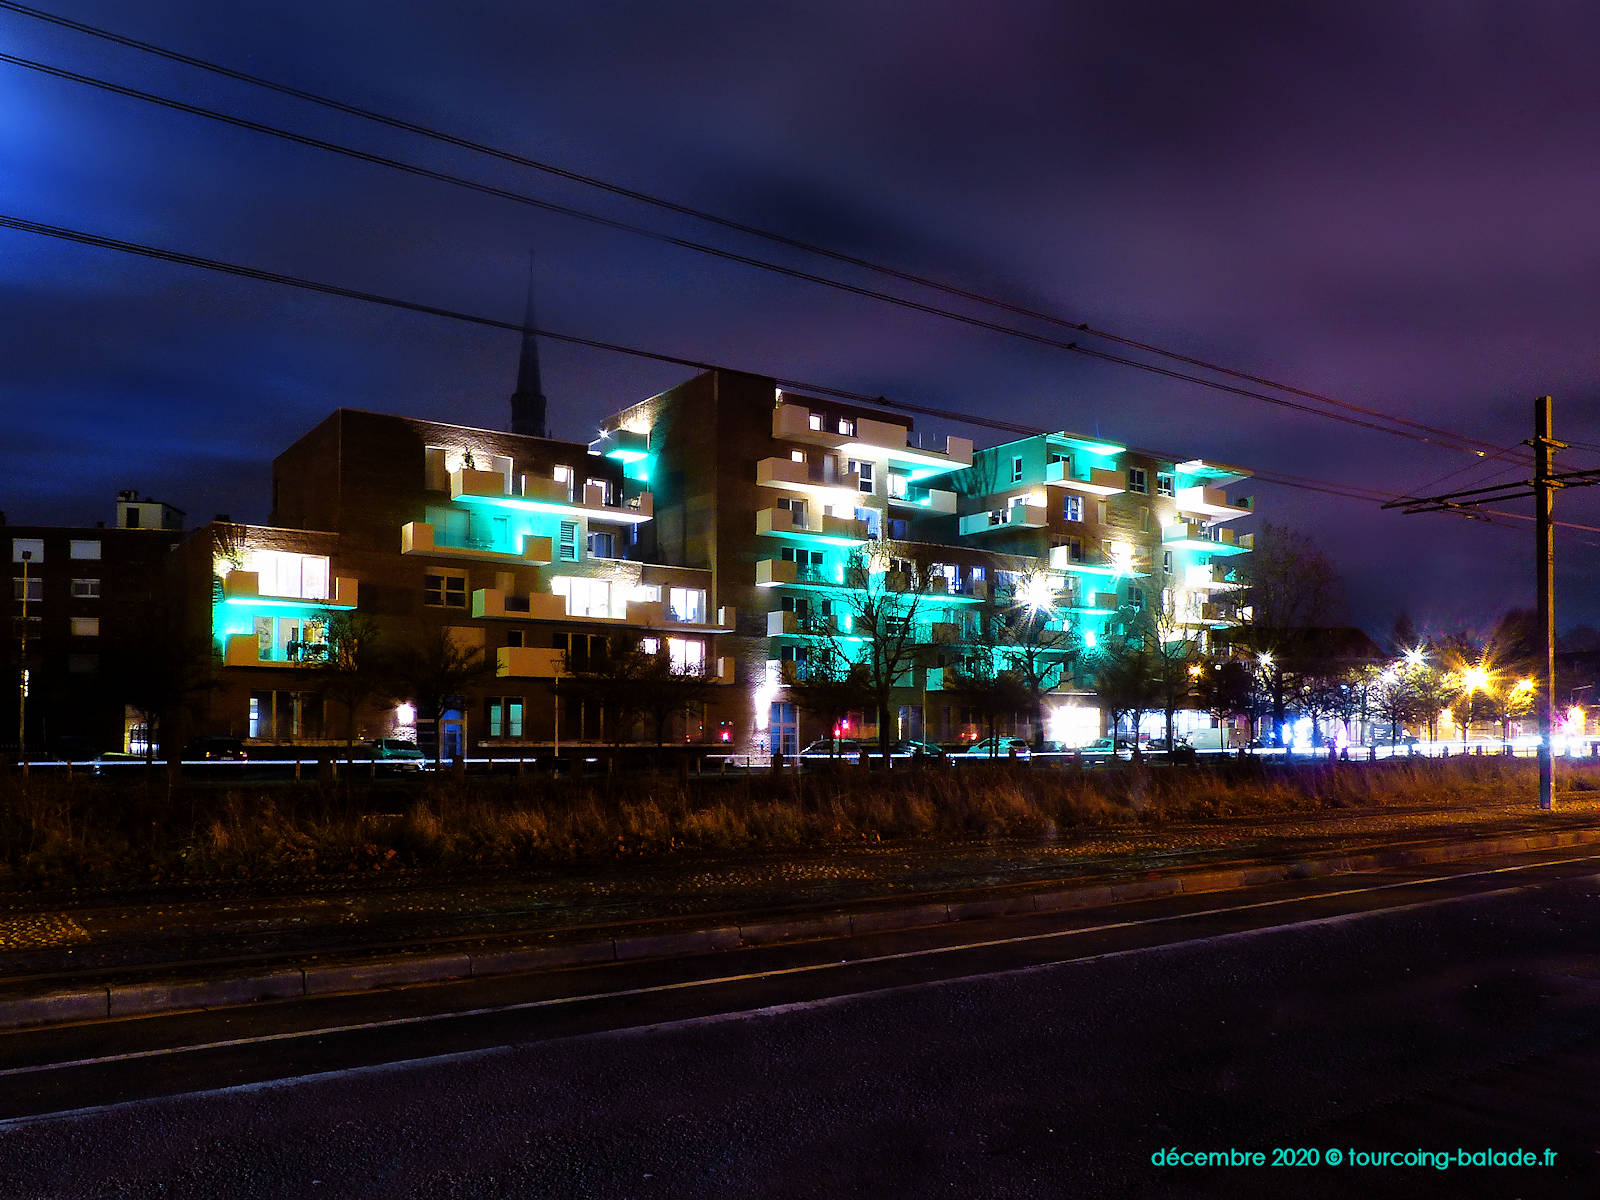 Résidence Equinox, Tramway, Tourcoing 2020